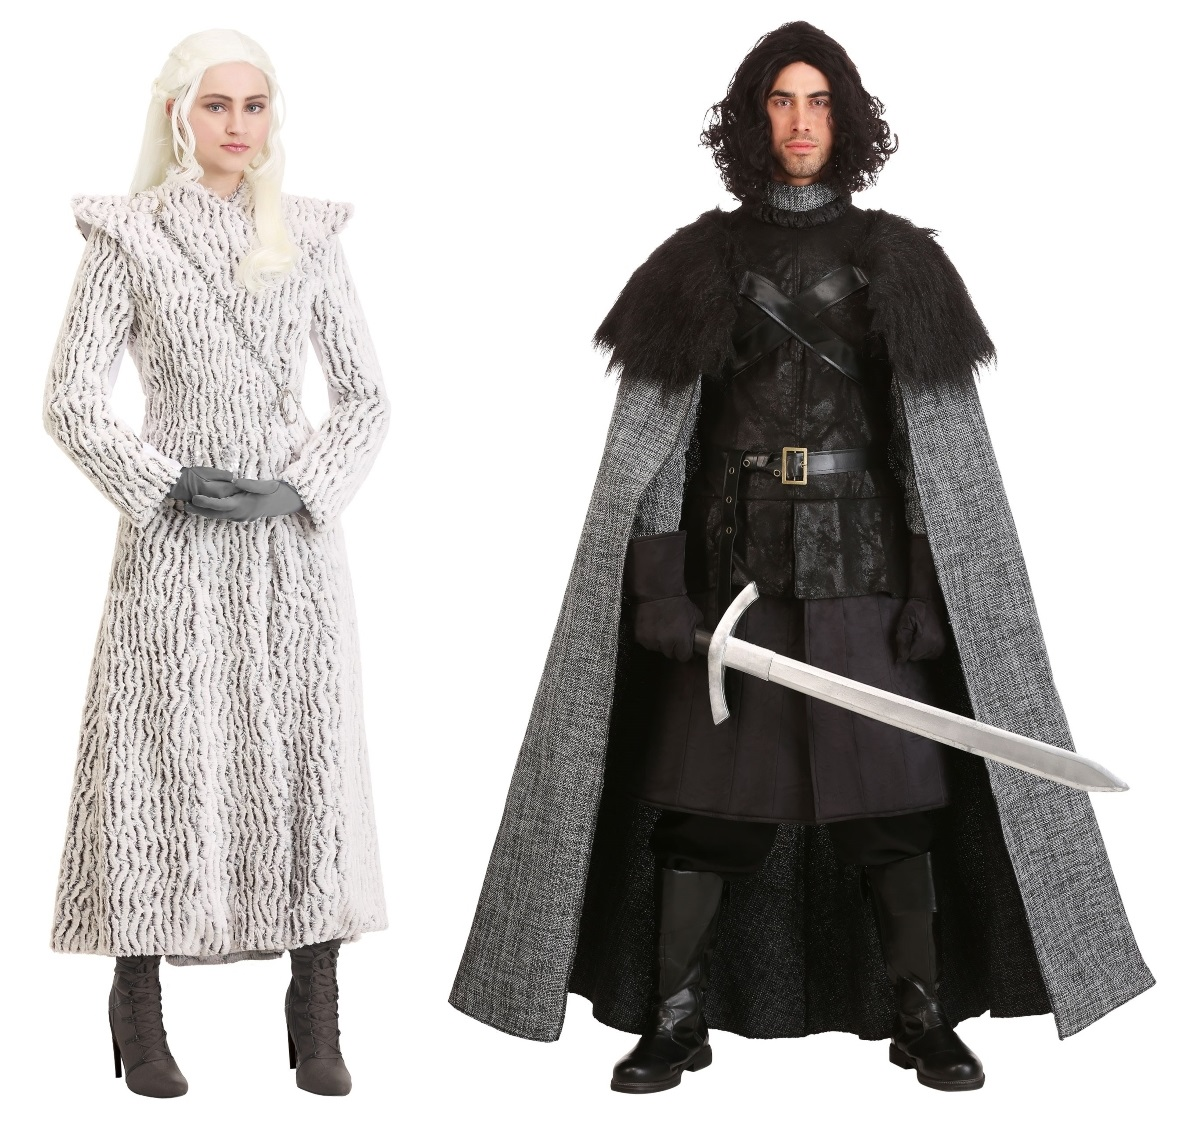 Jon Snow and Daenerys Couples Costumes